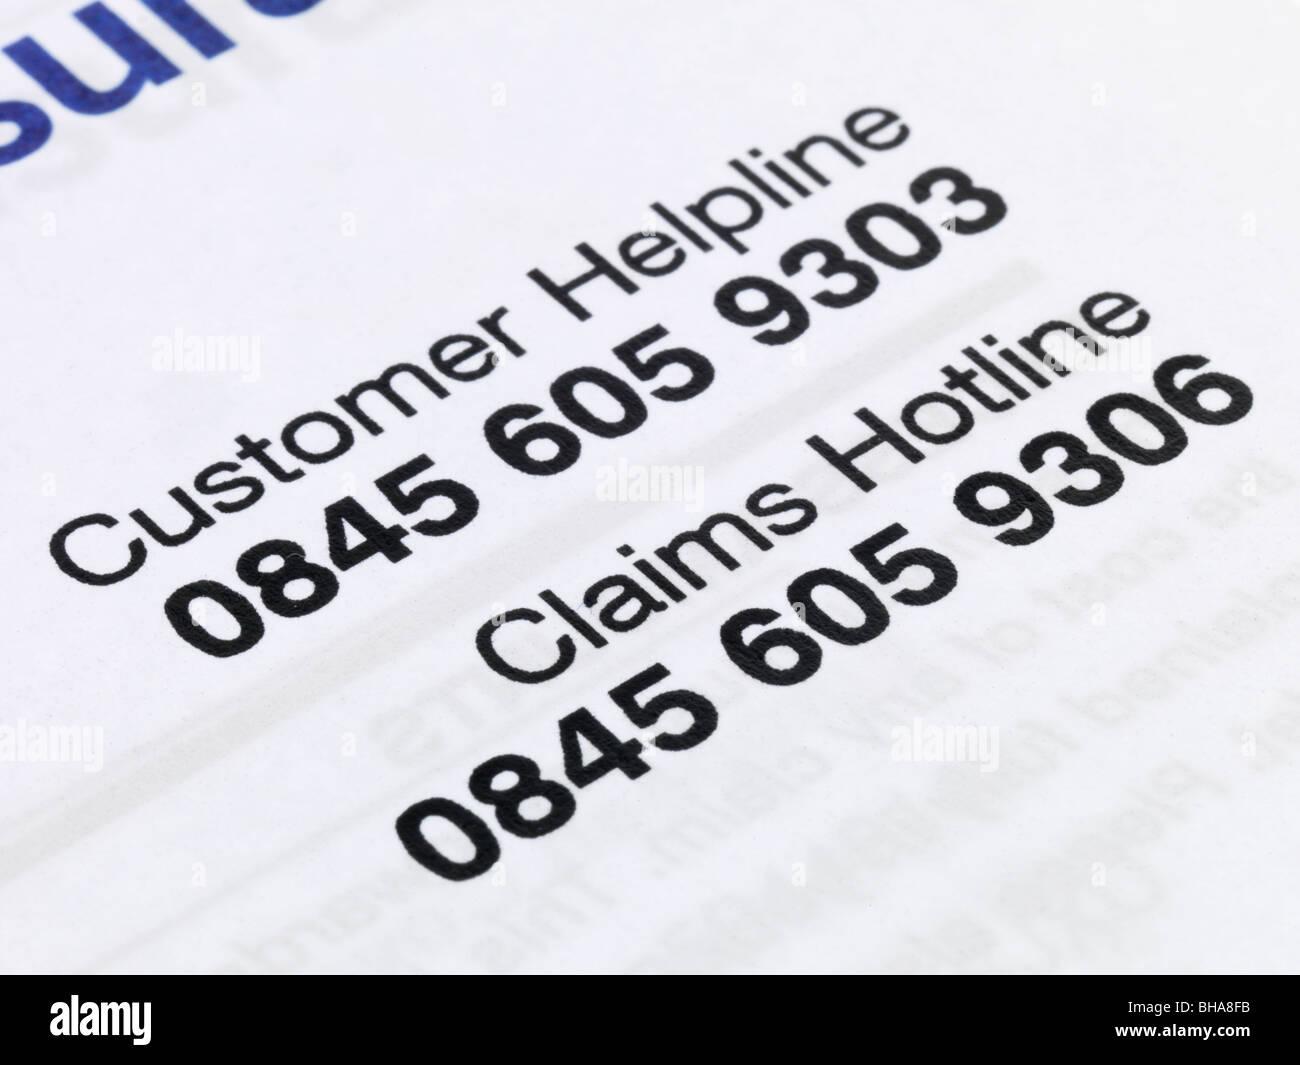 Car Insurance Helpline Stock Photo